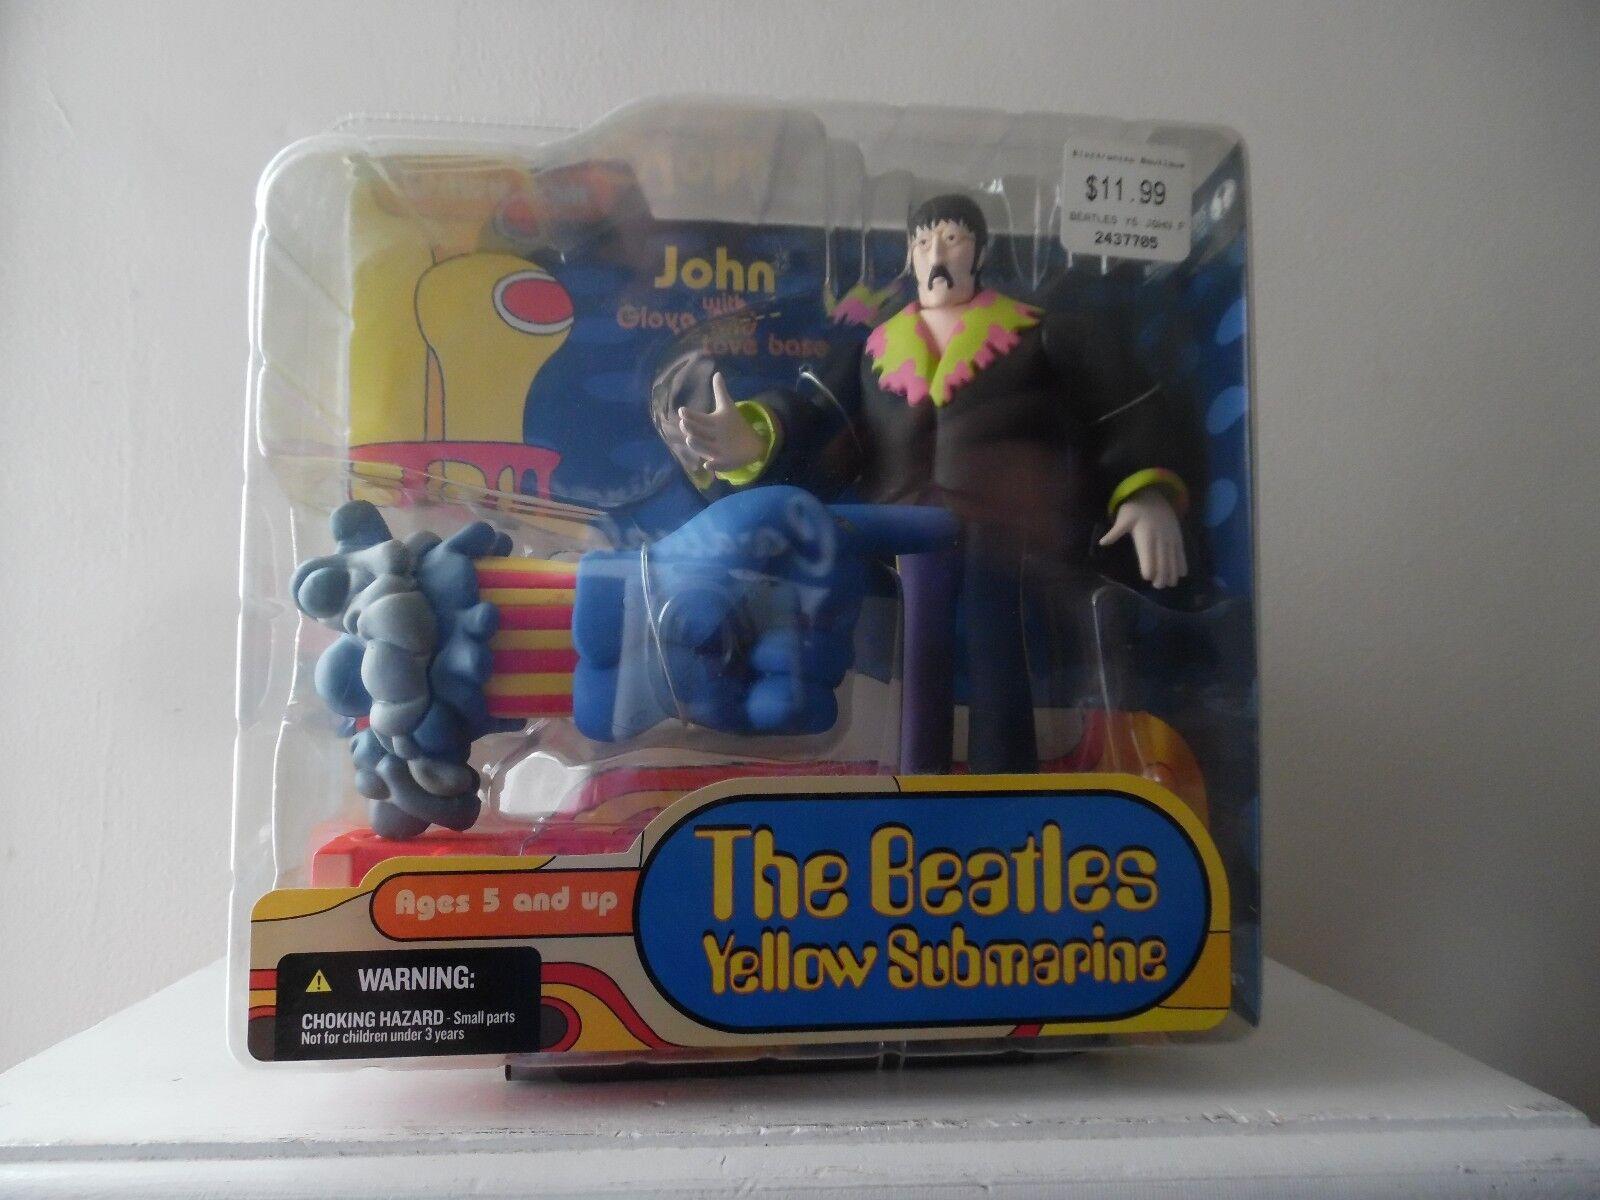 BEATLES - YELLOW SUBMARINE - - - SPAWN.COM TOY - NEW IN BOX -  SEALED  -  JOHN  6df266